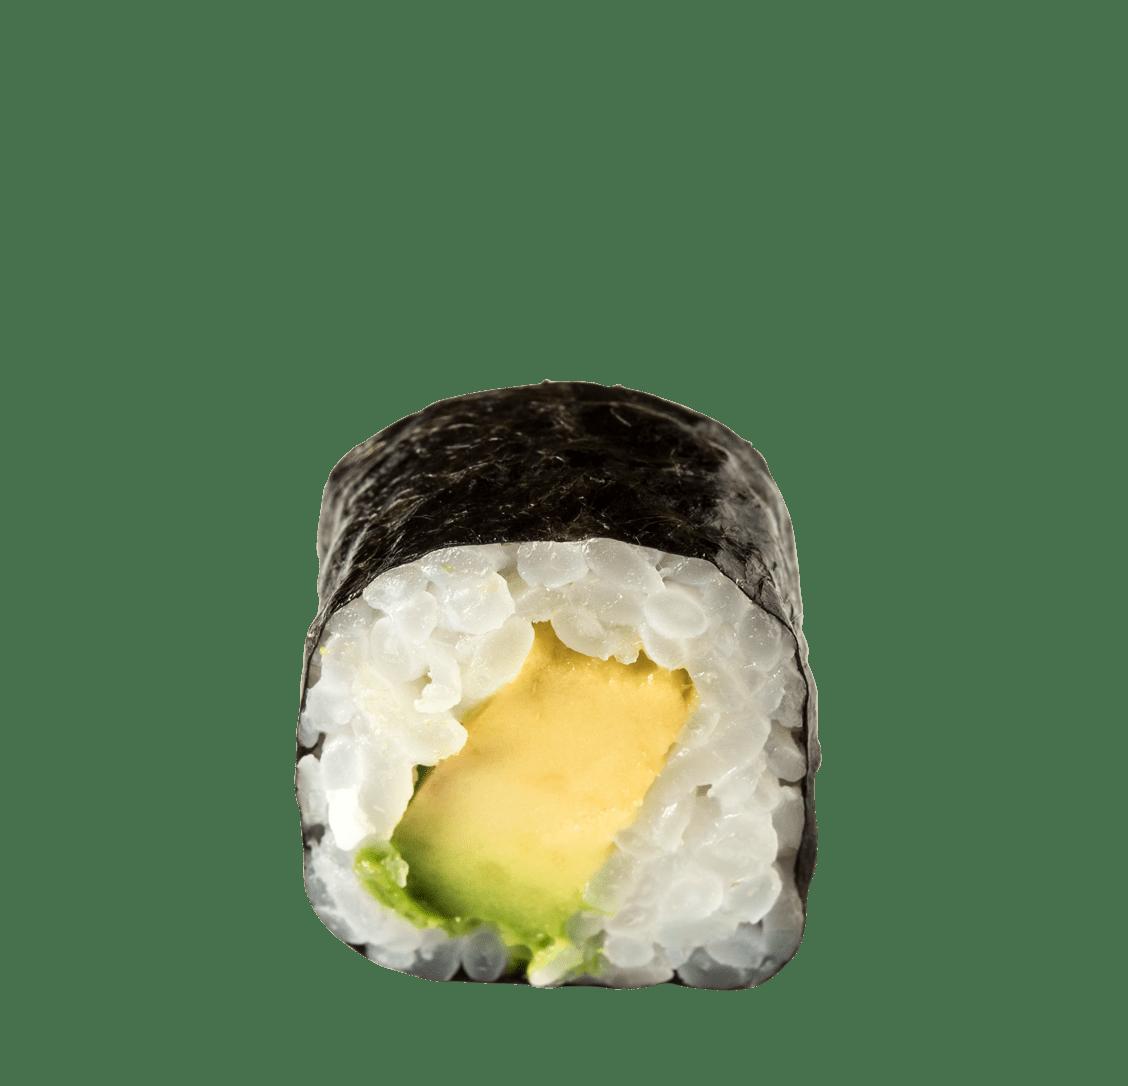 Avocado Maki</br>5,50 € title=Avocado Maki</br>5,50 €